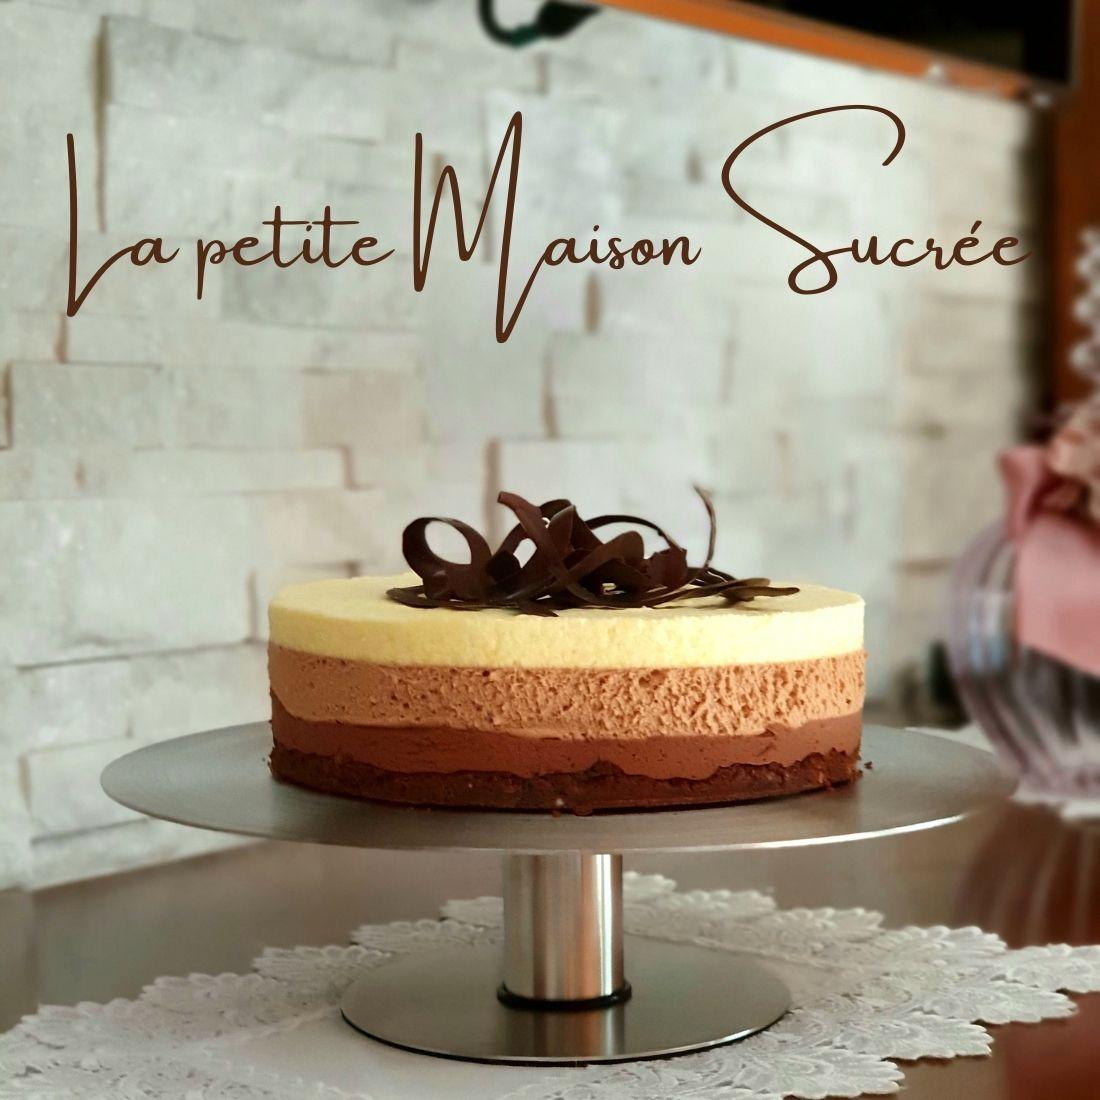 Mousse ai tre cioccolati ispirata alla ricetta di Ernst Knam